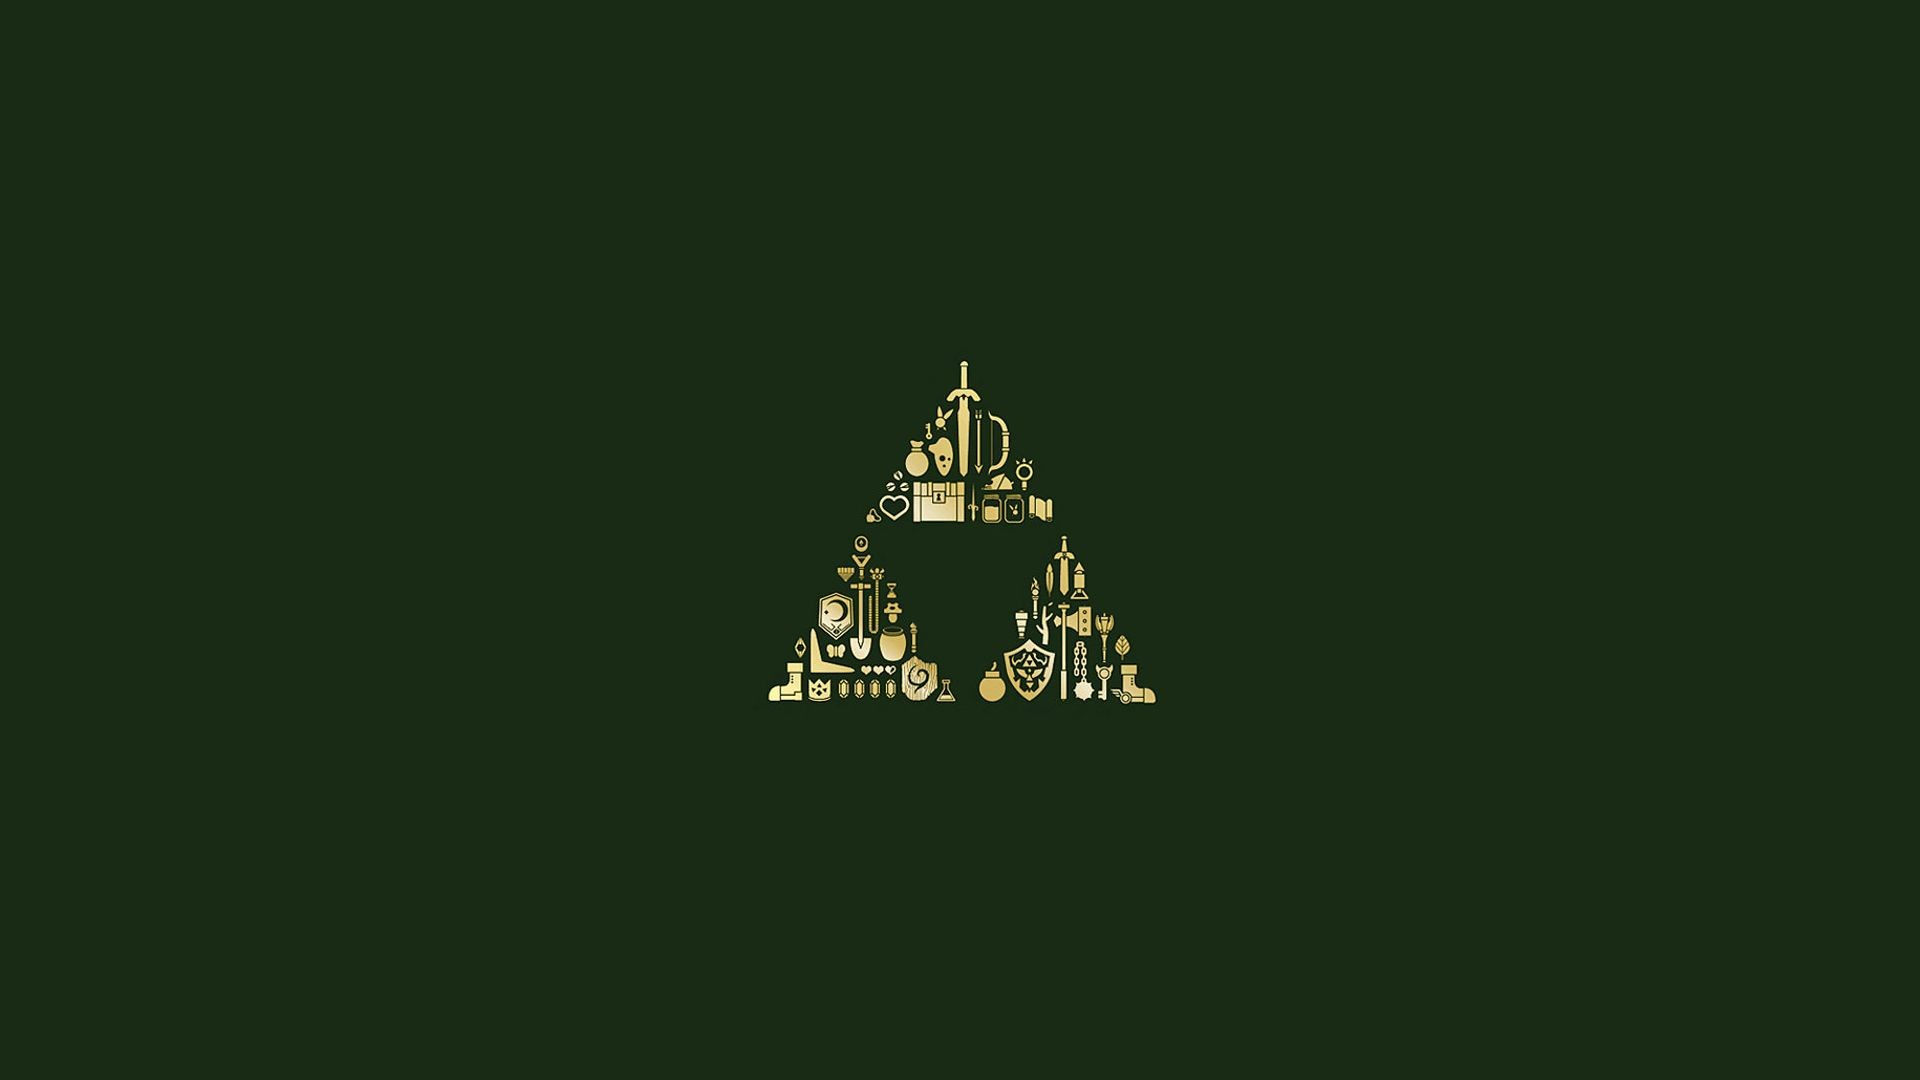 … Zelda Hd Wallpapers Page 9. Download